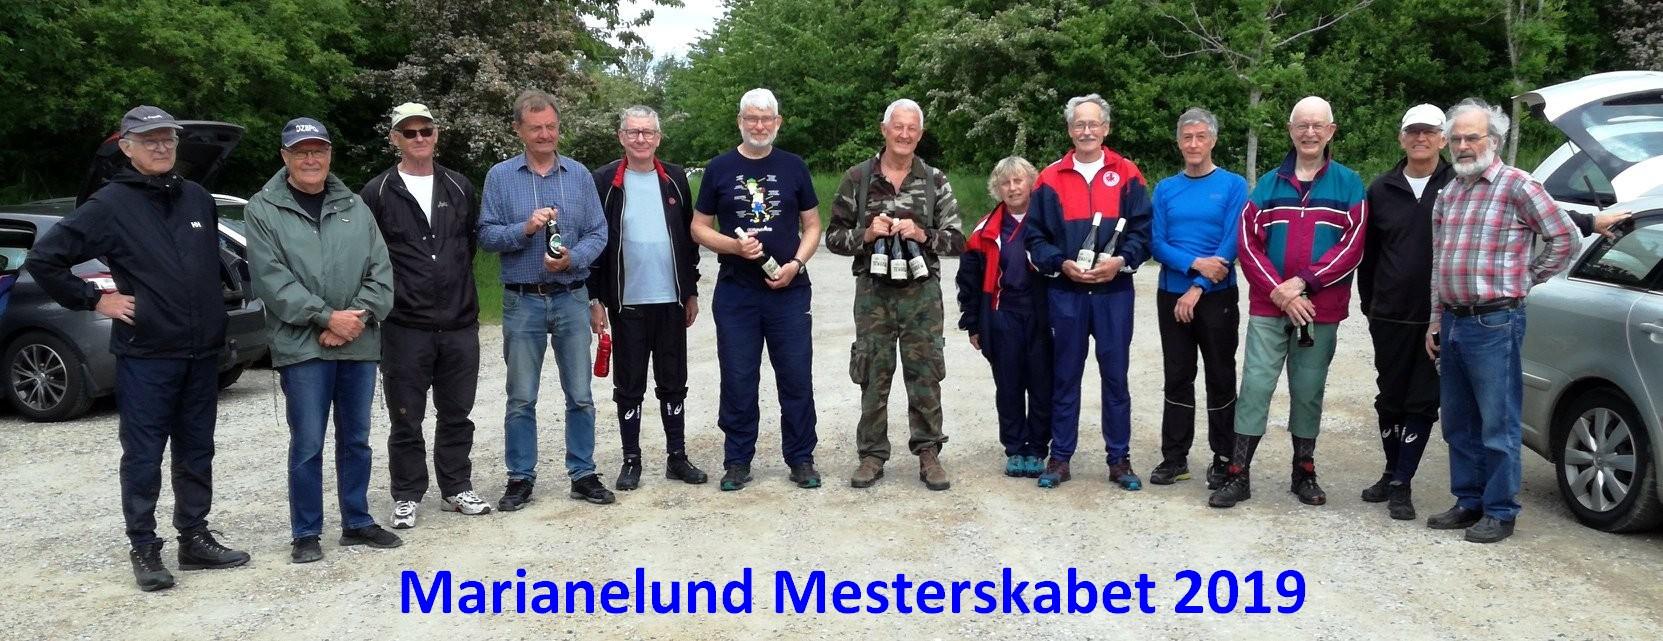 Marianelund-mesterskabet-2019 i Vestskoven